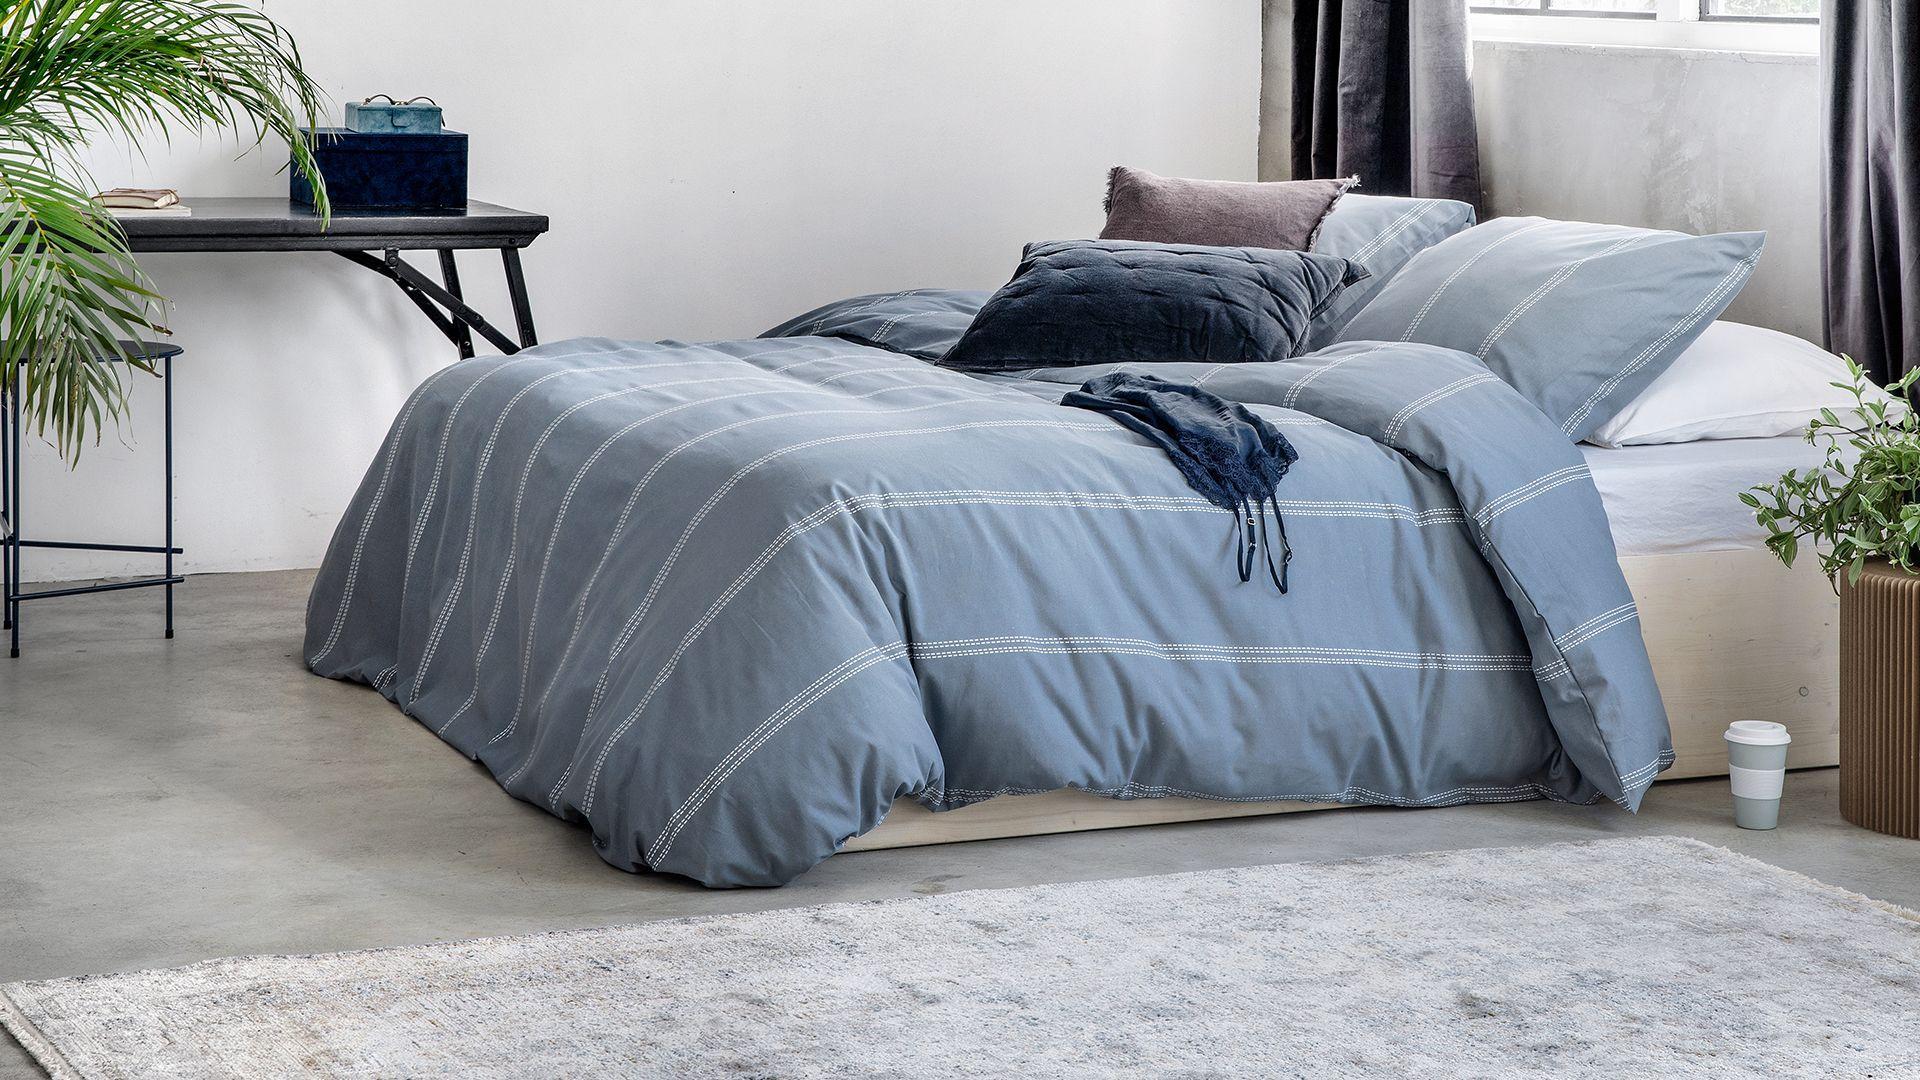 Walra Remade Cotton Blend dekbedovertrek blauw